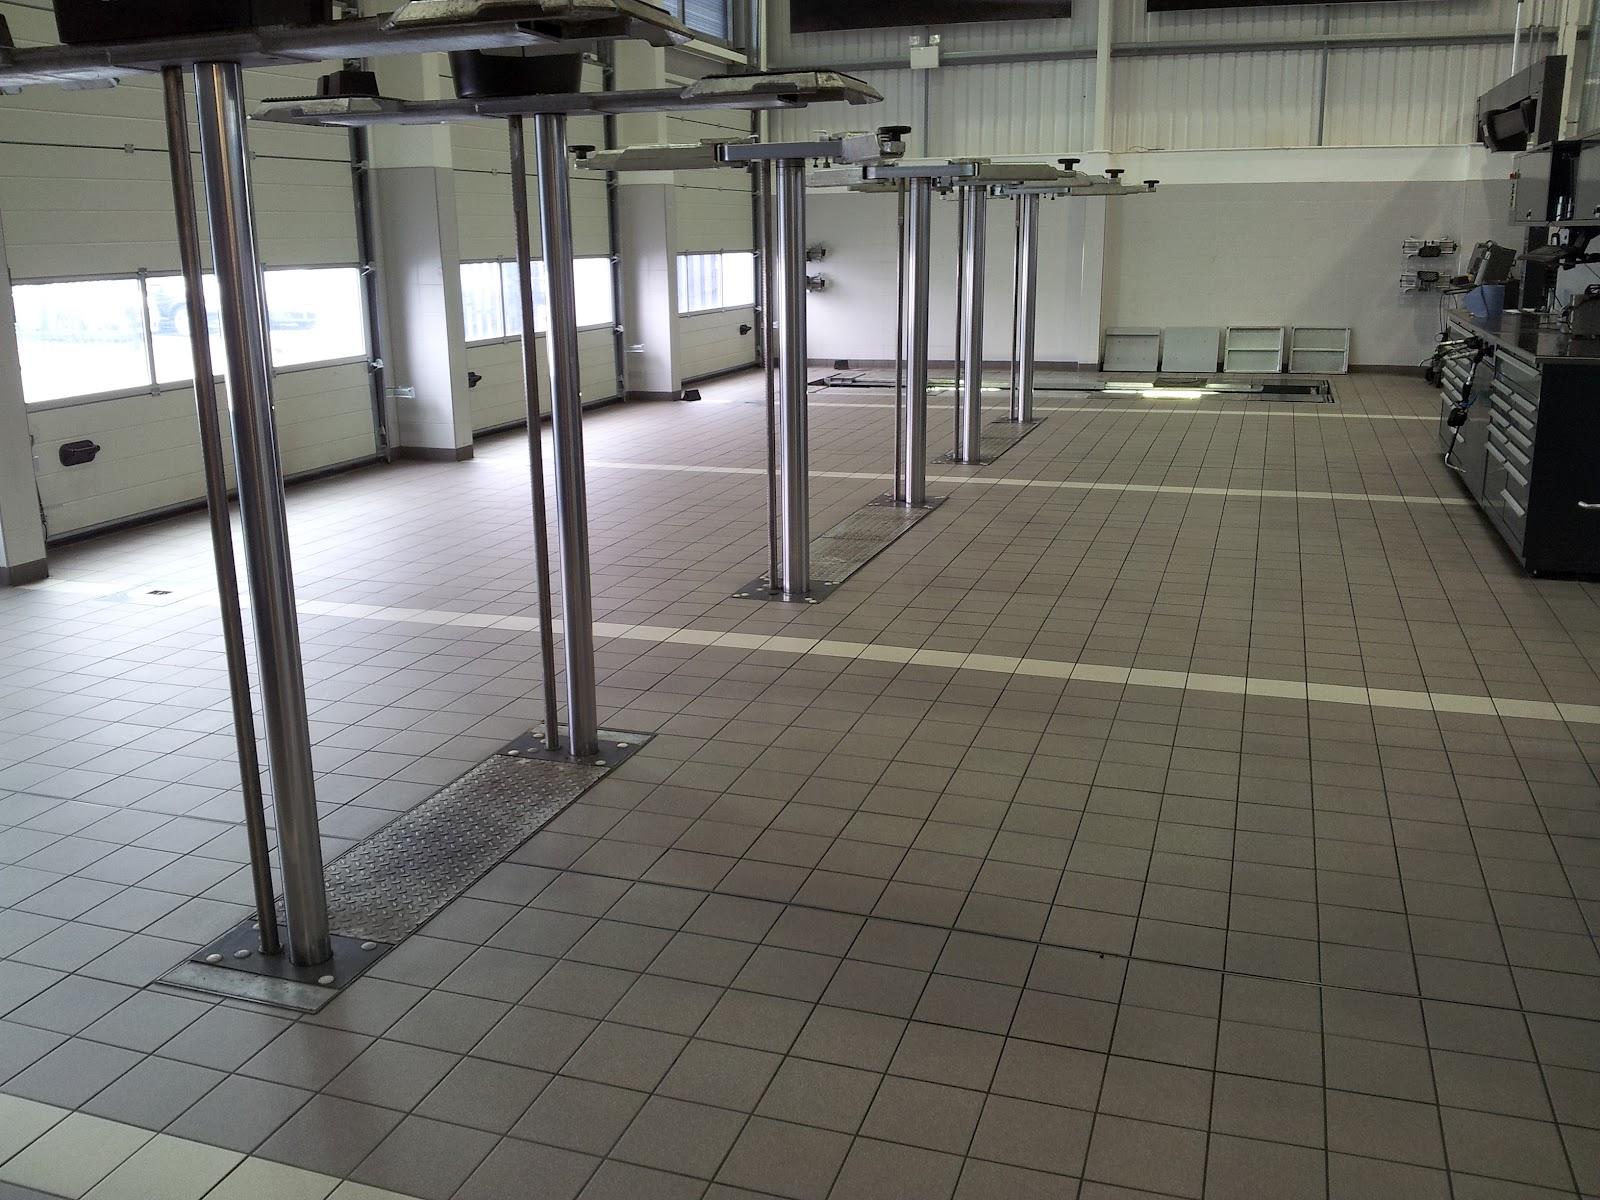 Gp Carpet Cleaning Workshop Floors Left Sparkling Clean